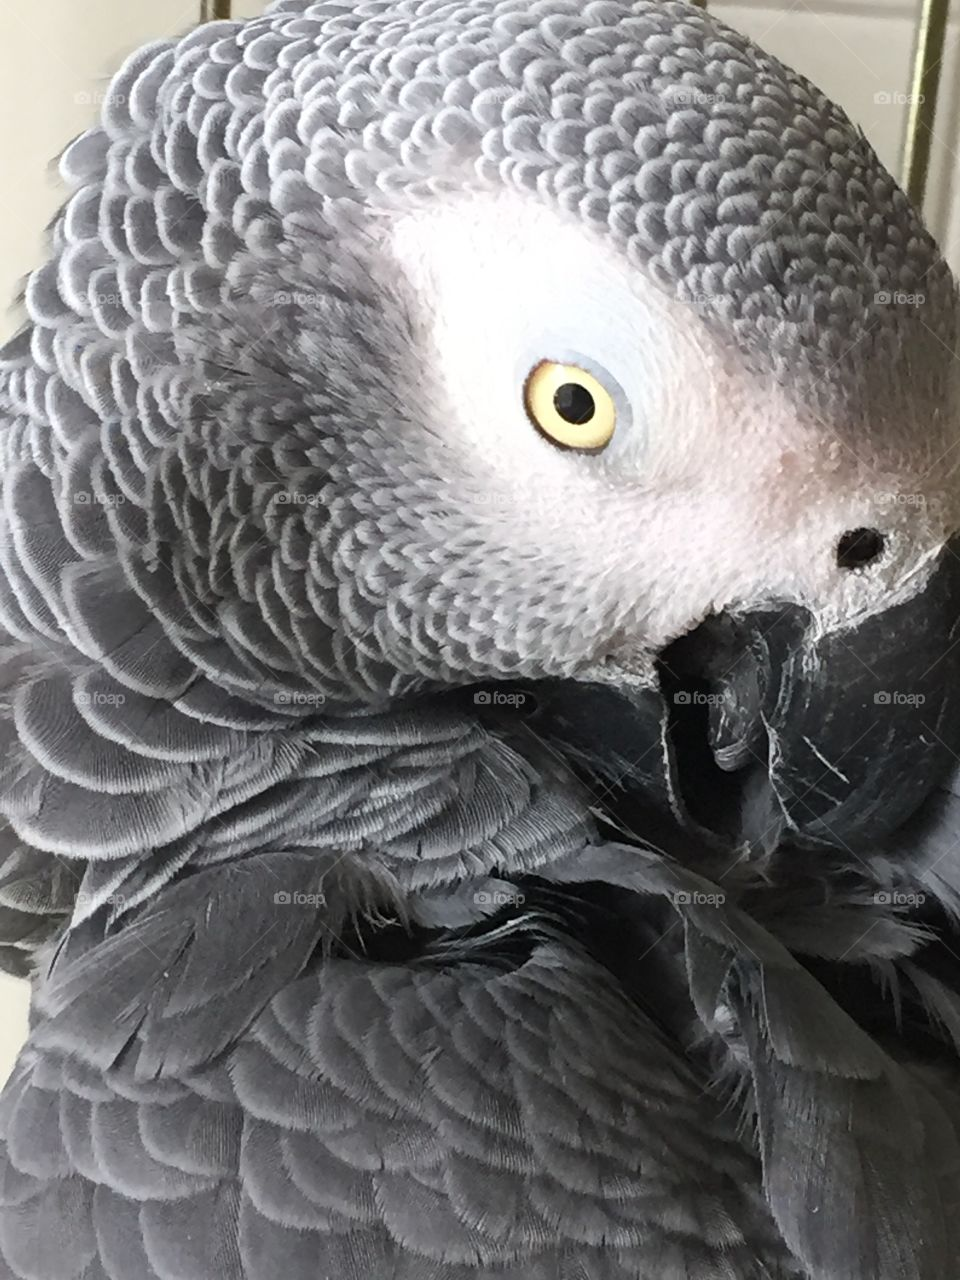 My Parrot !!!